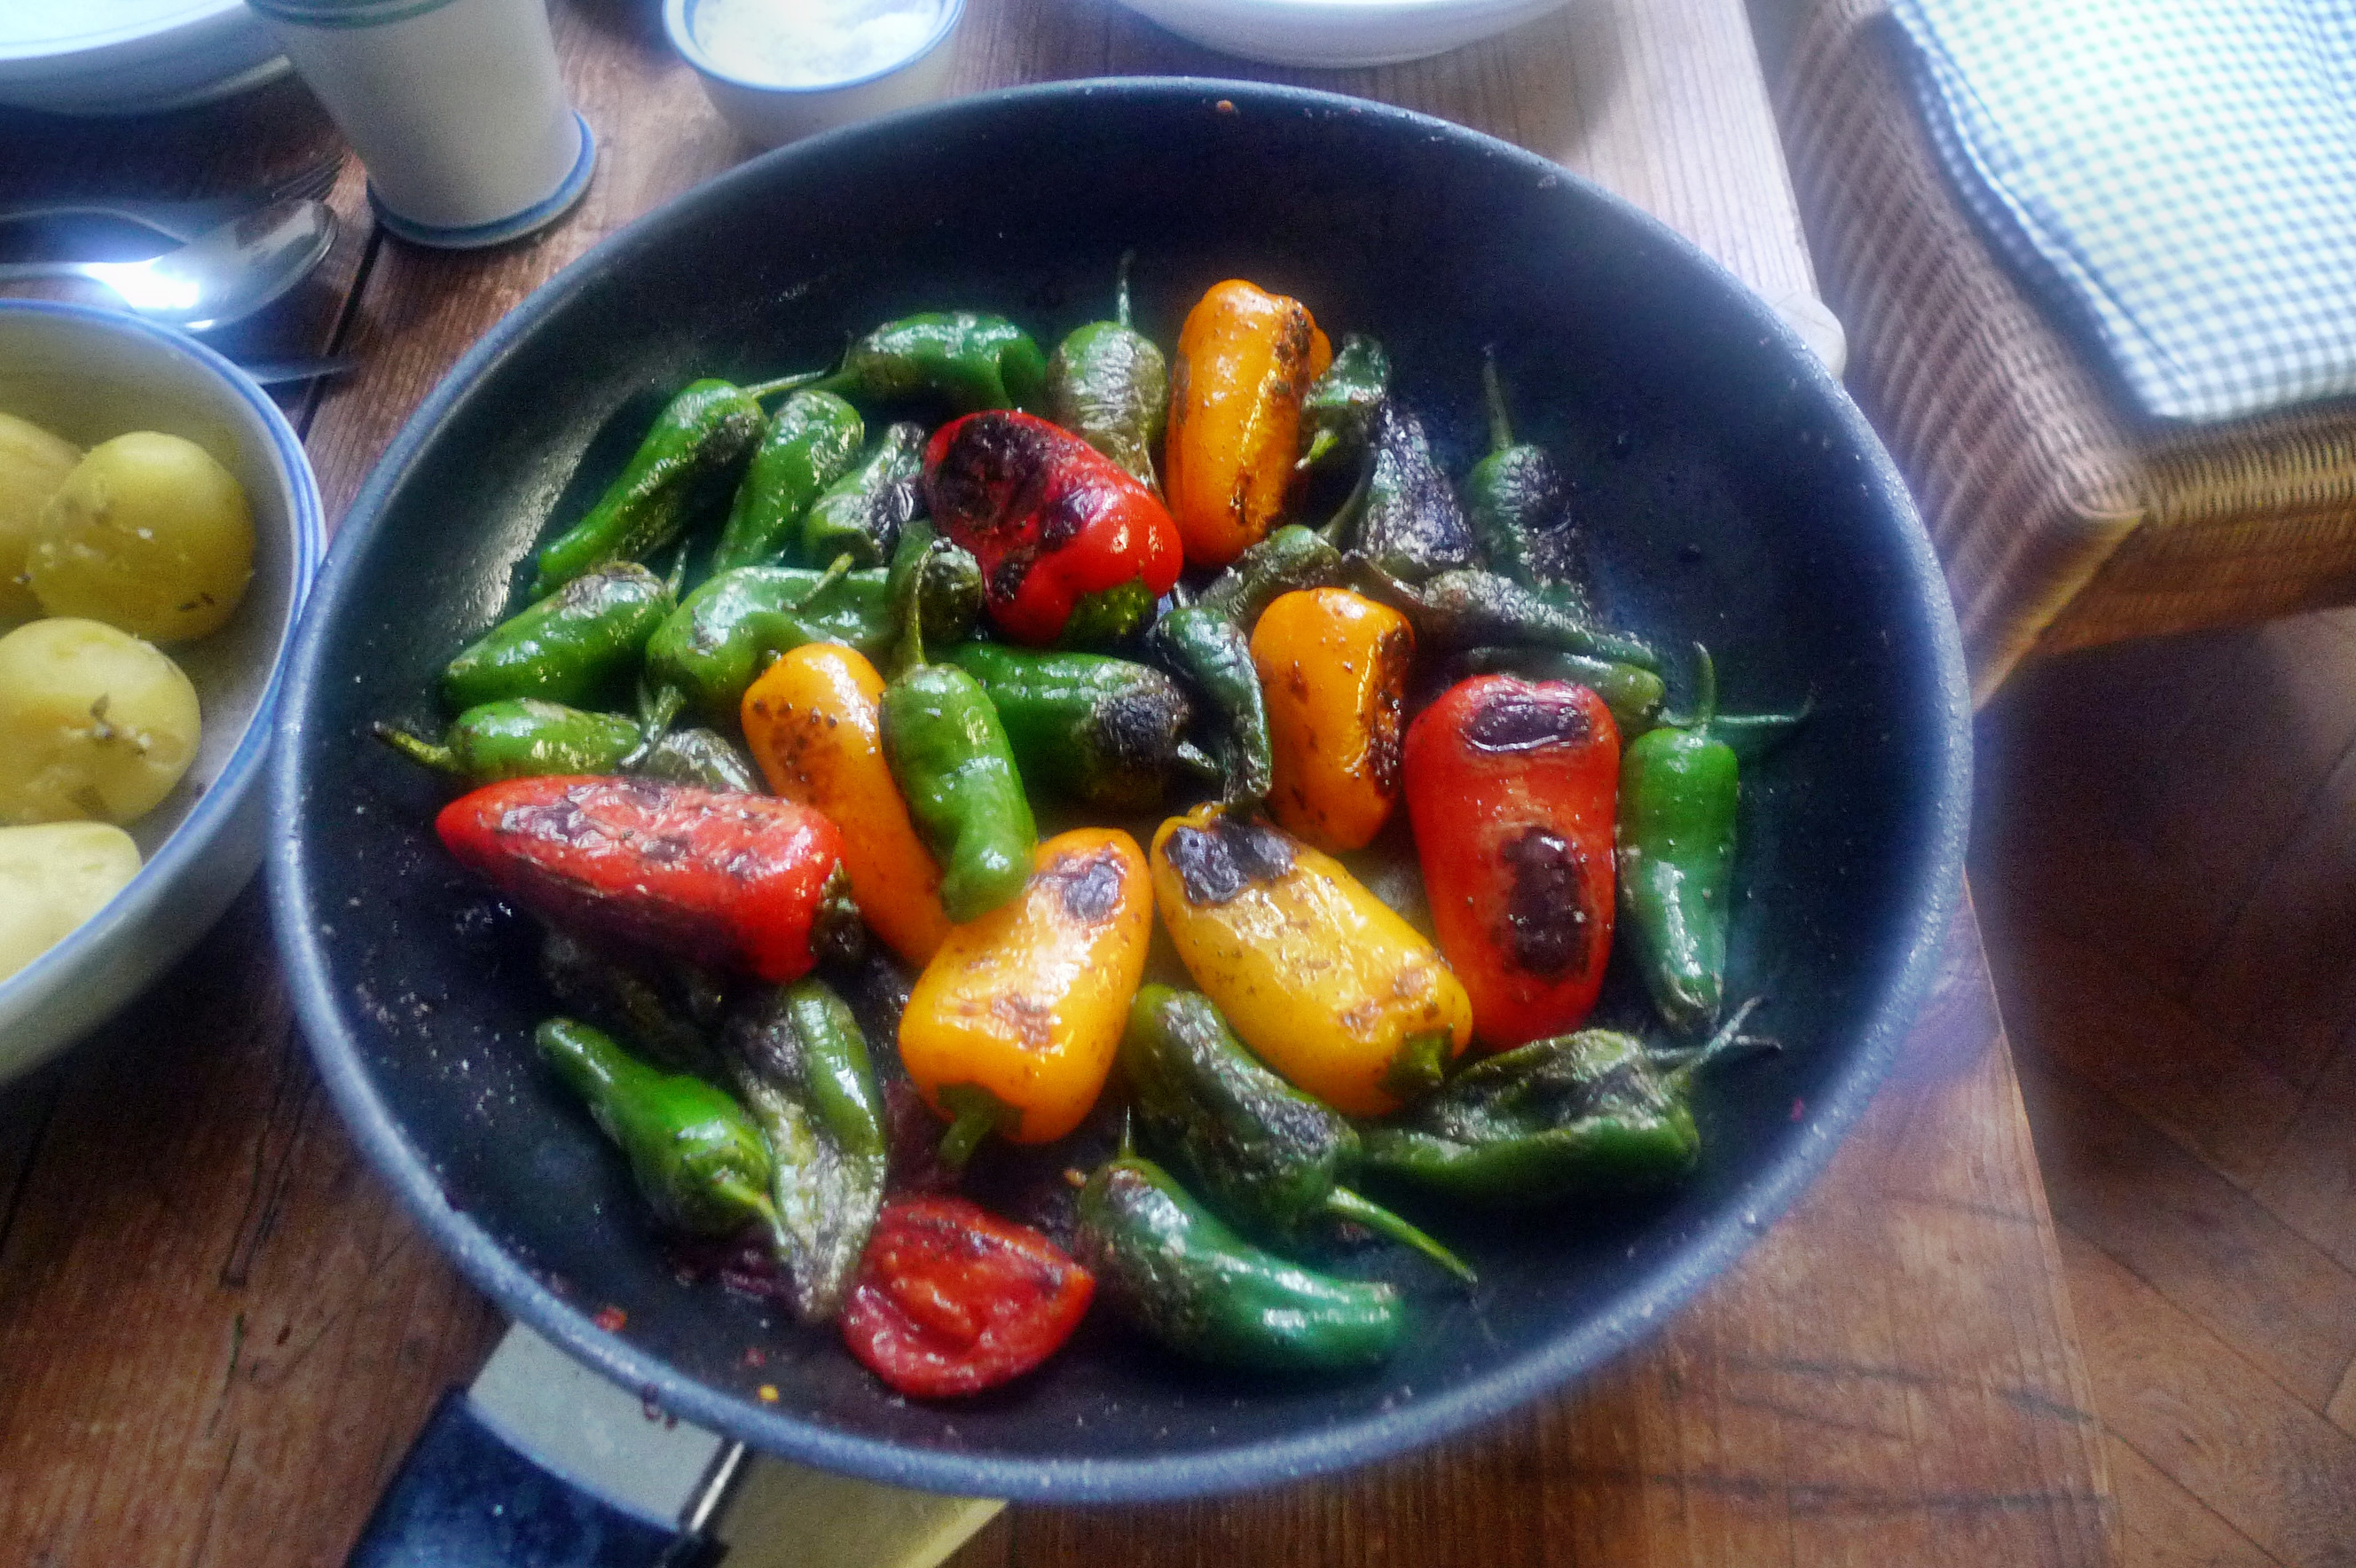 Pimentos-Paprika-Kartoffel-Salat-Buttermilch- 28.9.14   (8)